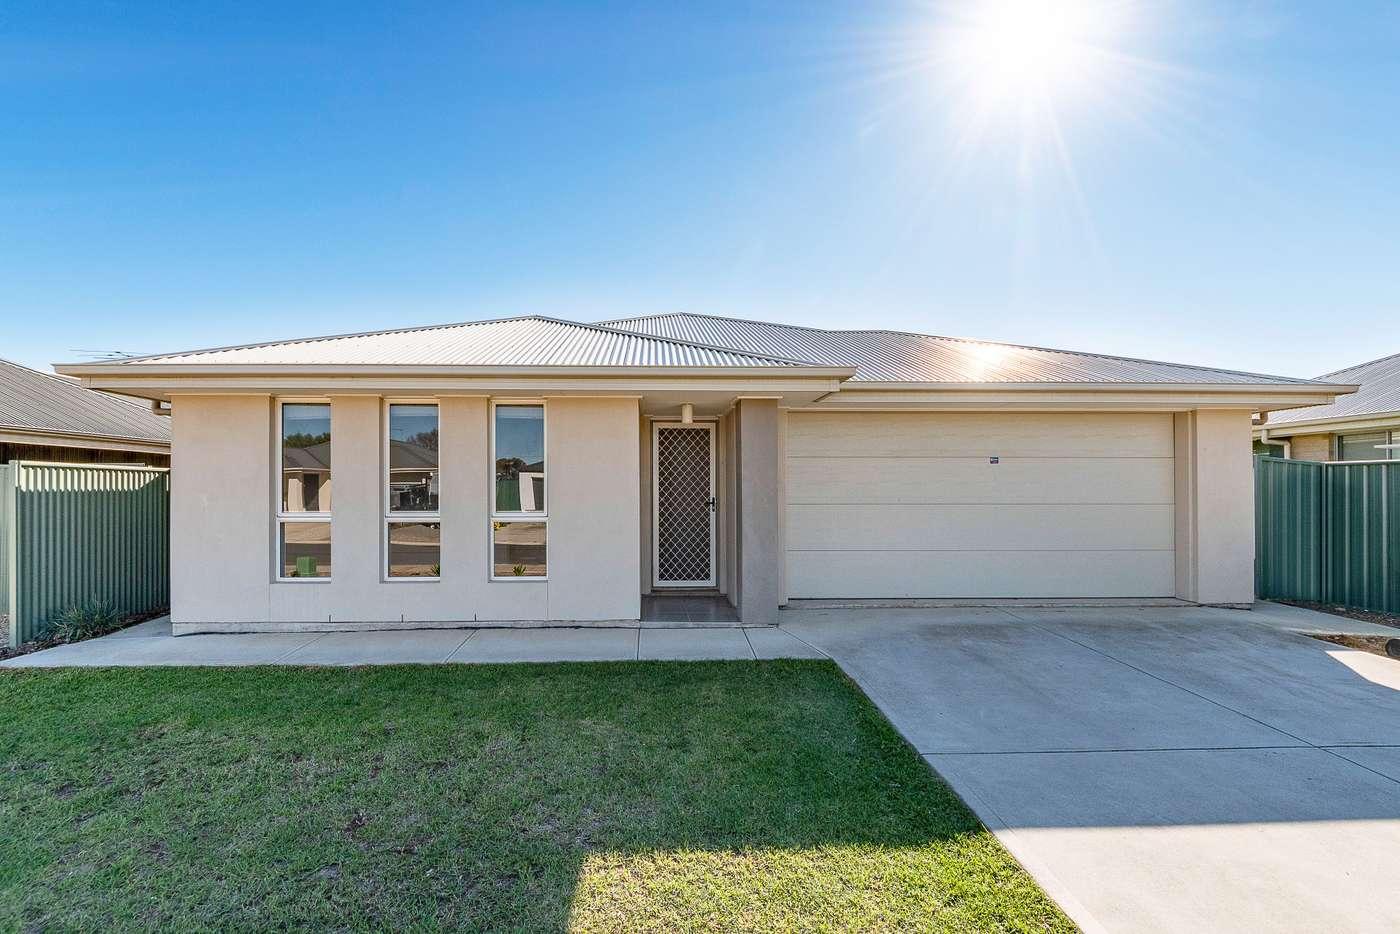 Main view of Homely house listing, 32 Pfitzner Close, Murray Bridge SA 5253